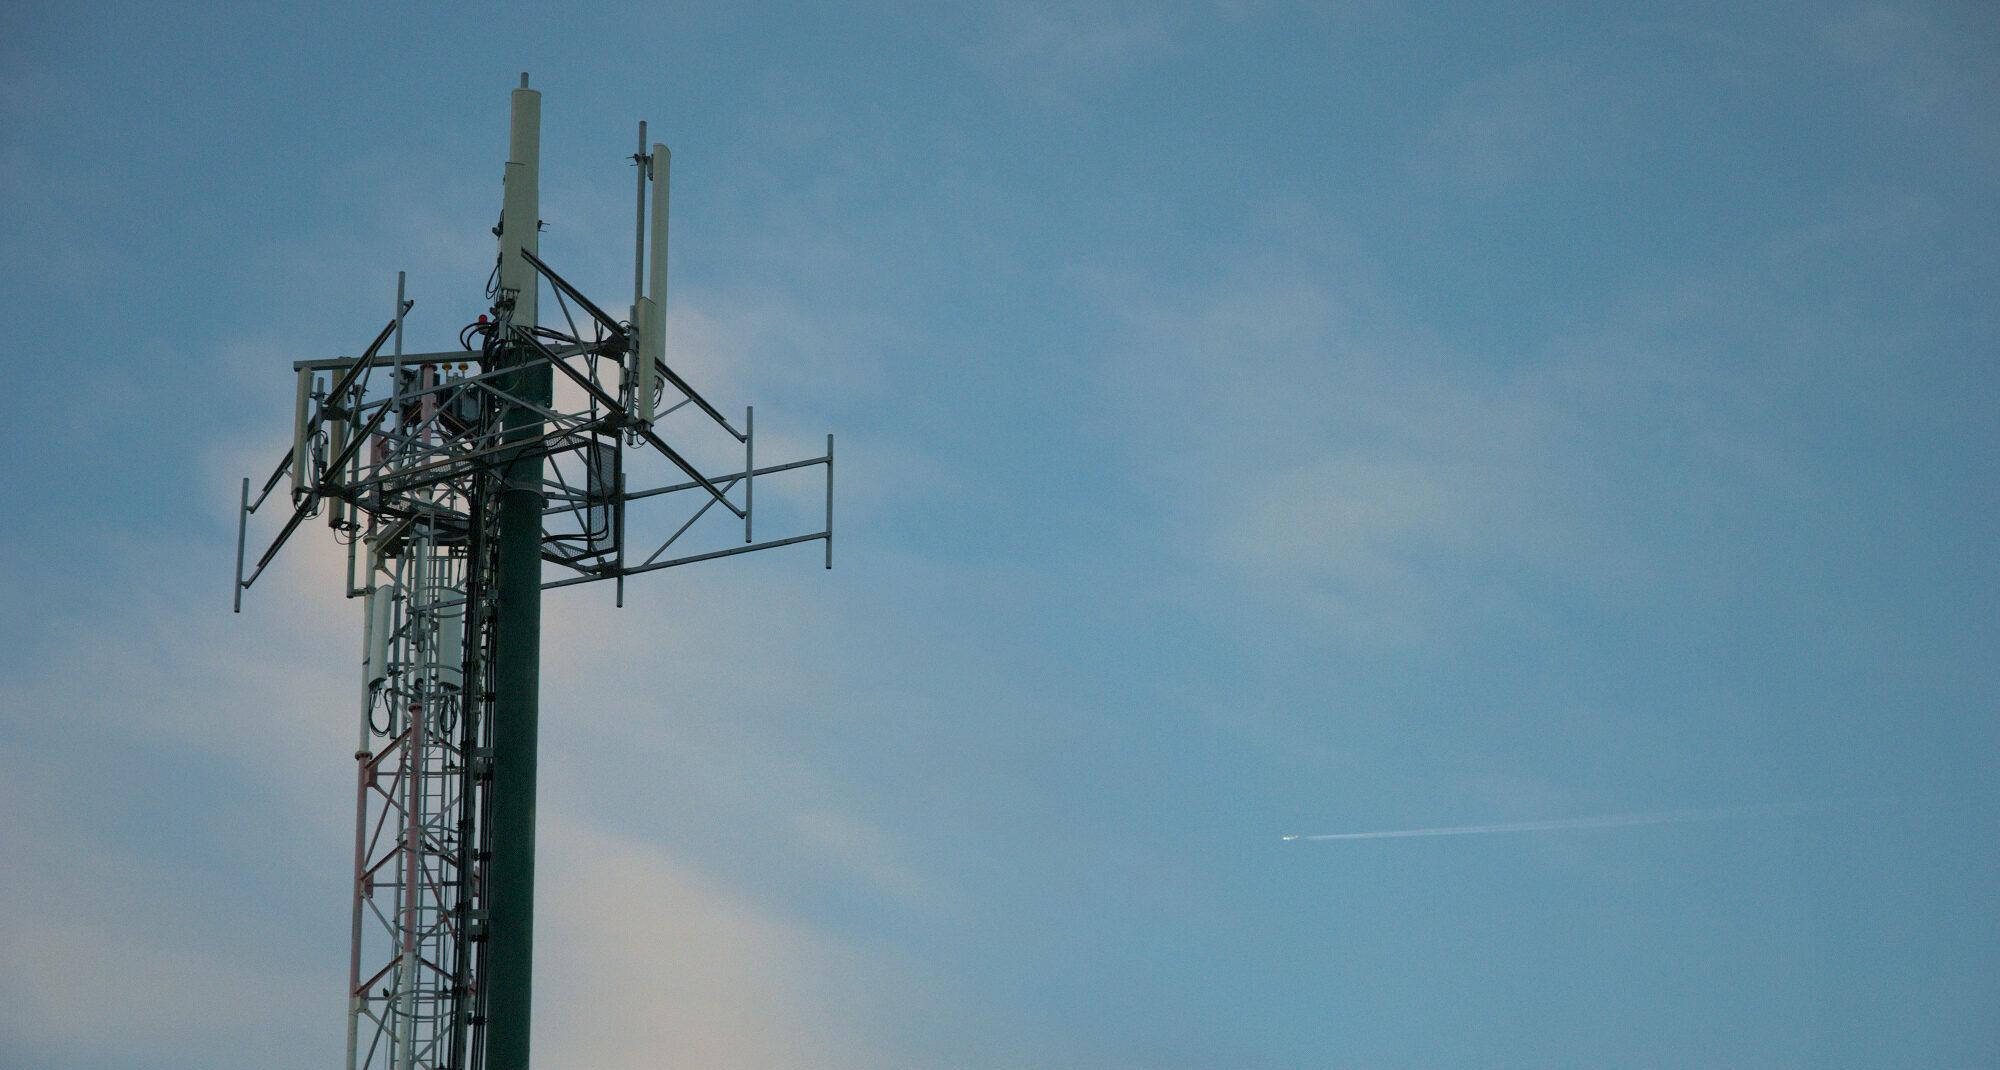 antenna backdrop sky